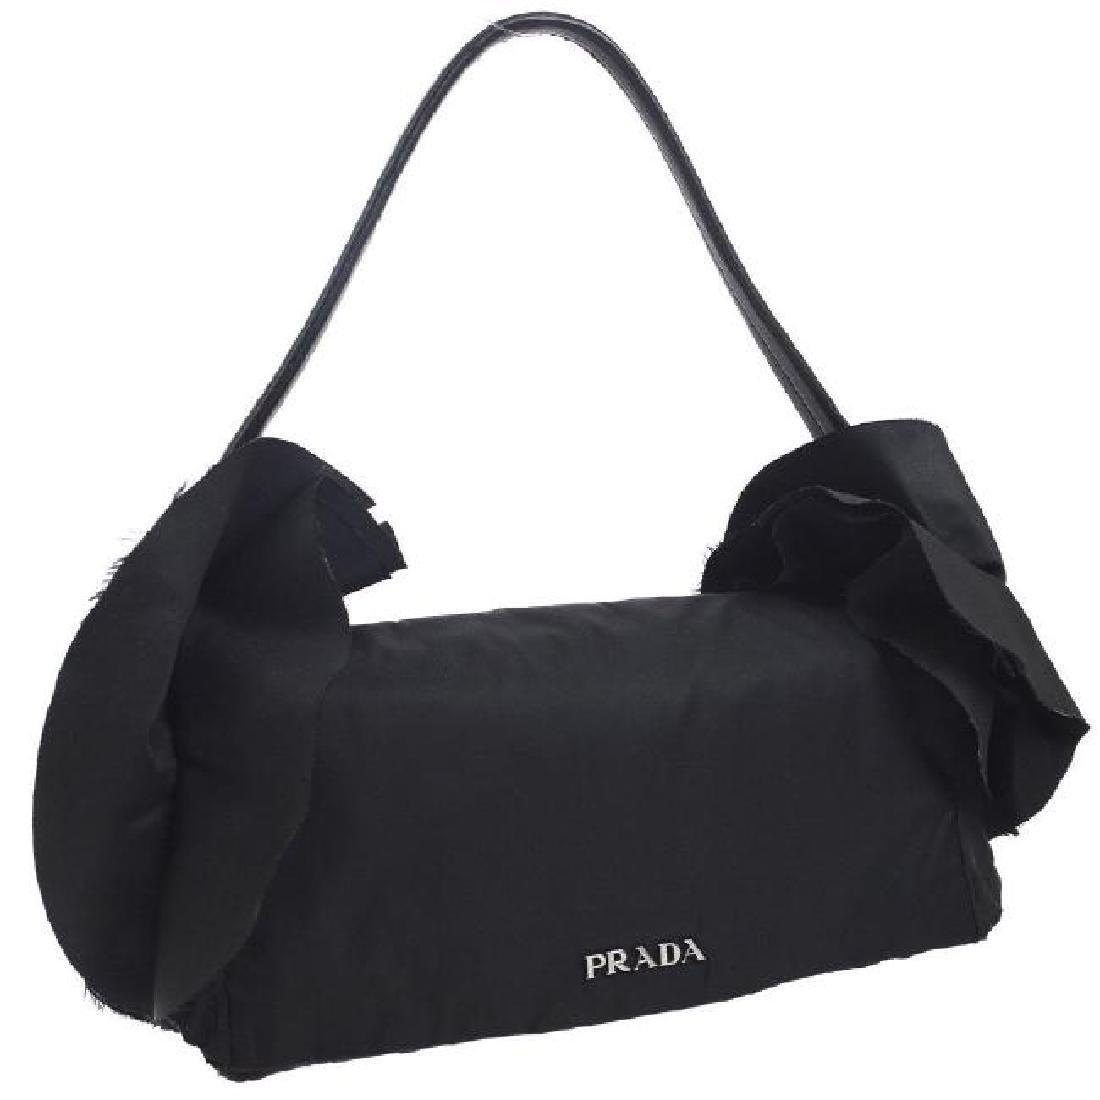 Vintage Prada Frill Nylon Handbag: Black